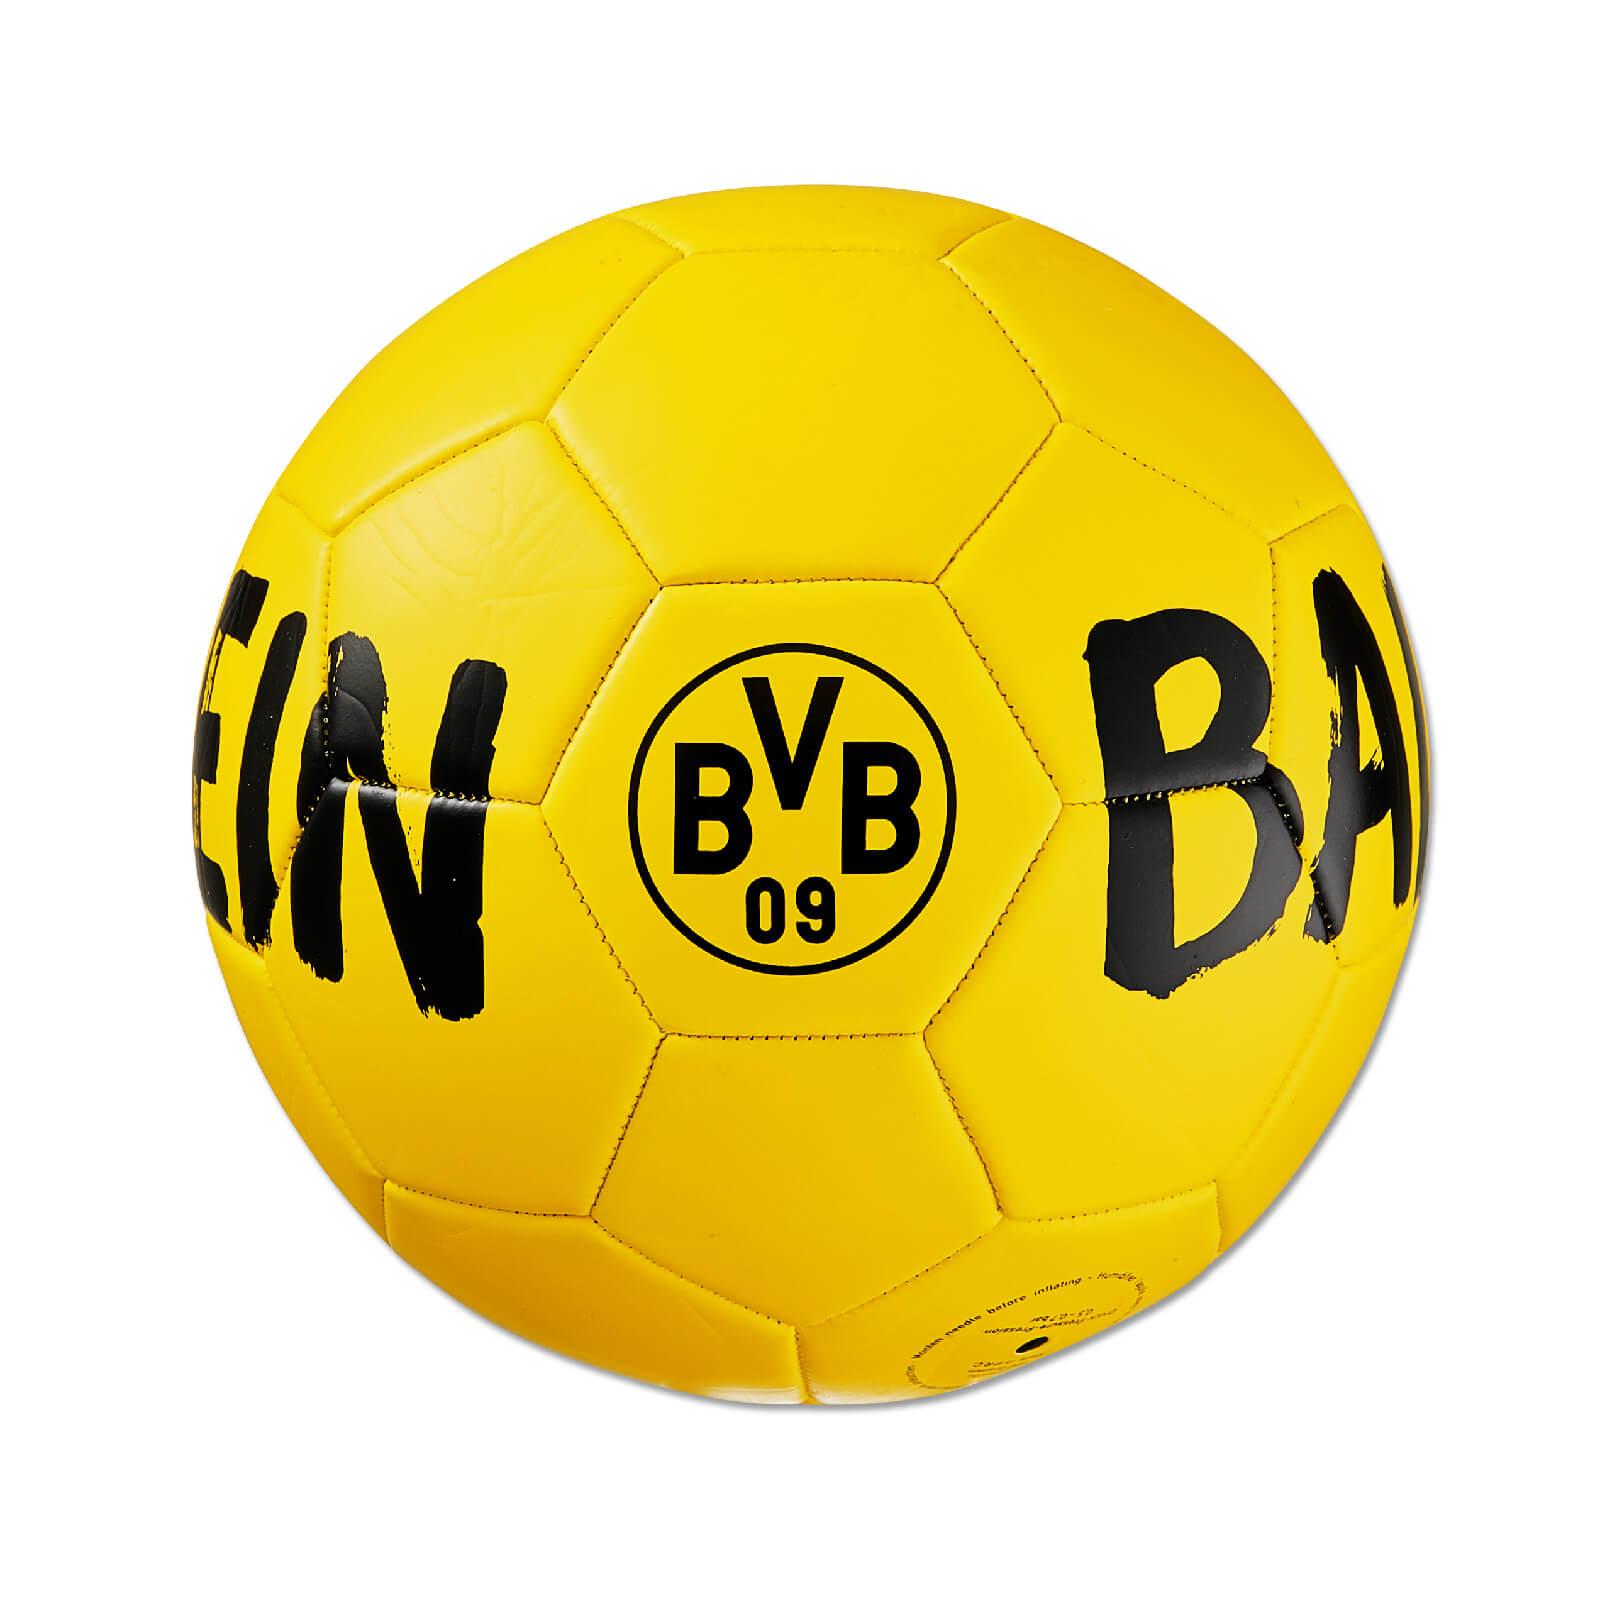 BVB Fußball Gr. 5 - bis 05.12.19 - gratis Versand ab 50€